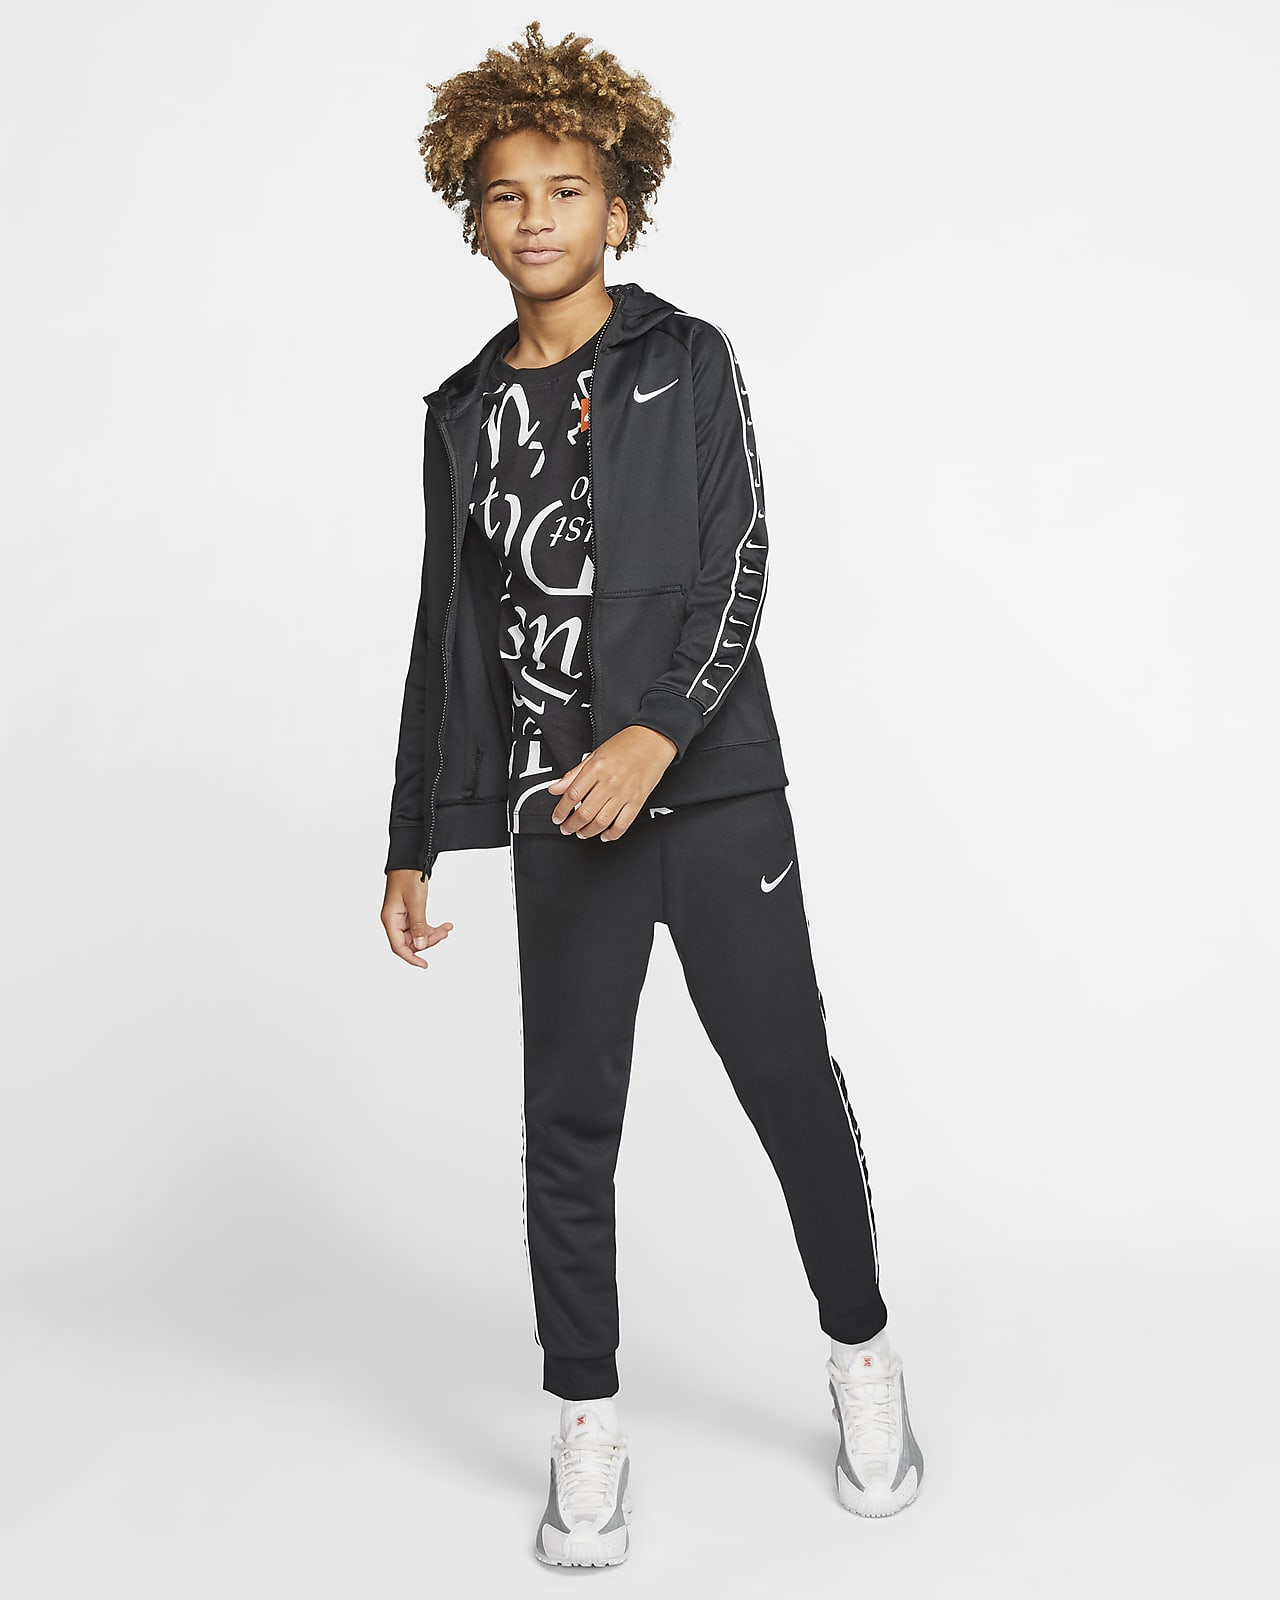 Delegar Red de comunicacion dialecto  Nike Sportswear Swoosh Jogger - Niño/a. Nike ES